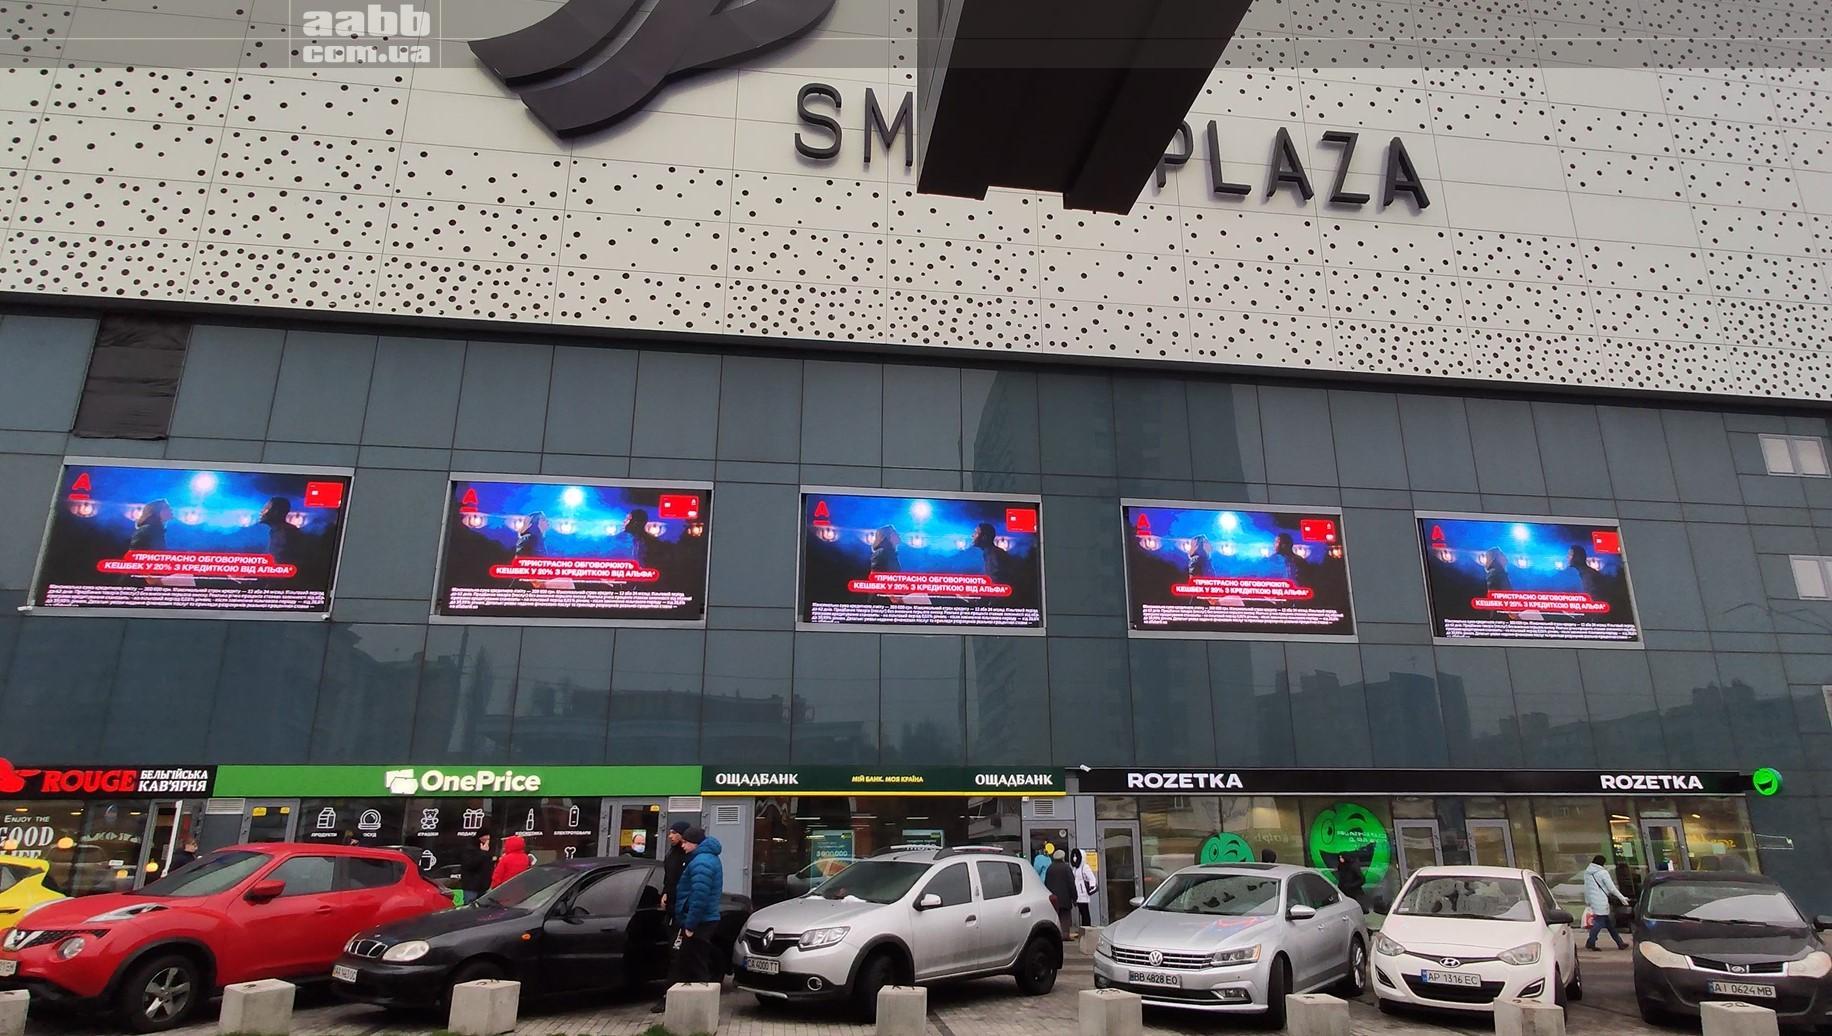 Реклама на медіафасаді ТРЦ Smart Plaza Polytech (листопад 2020)